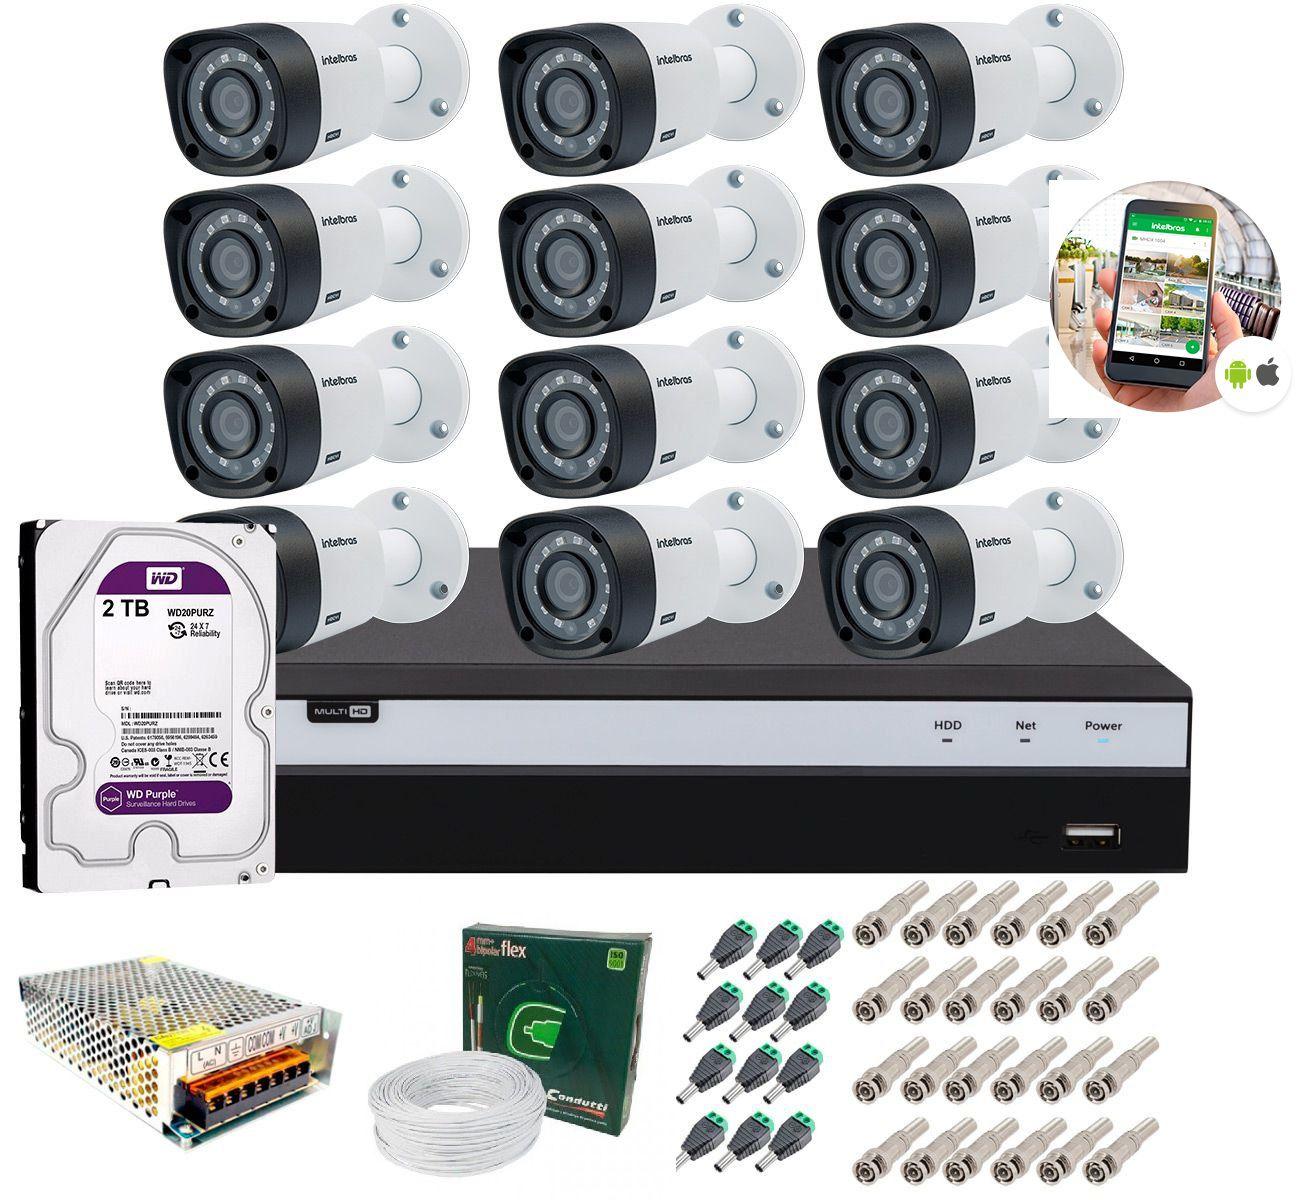 Kit 12 Câmeras de Segurança Intelbras Full HD 1080p VHD 1220B IR + DVR Full HD C/ 2TB + Acessórios